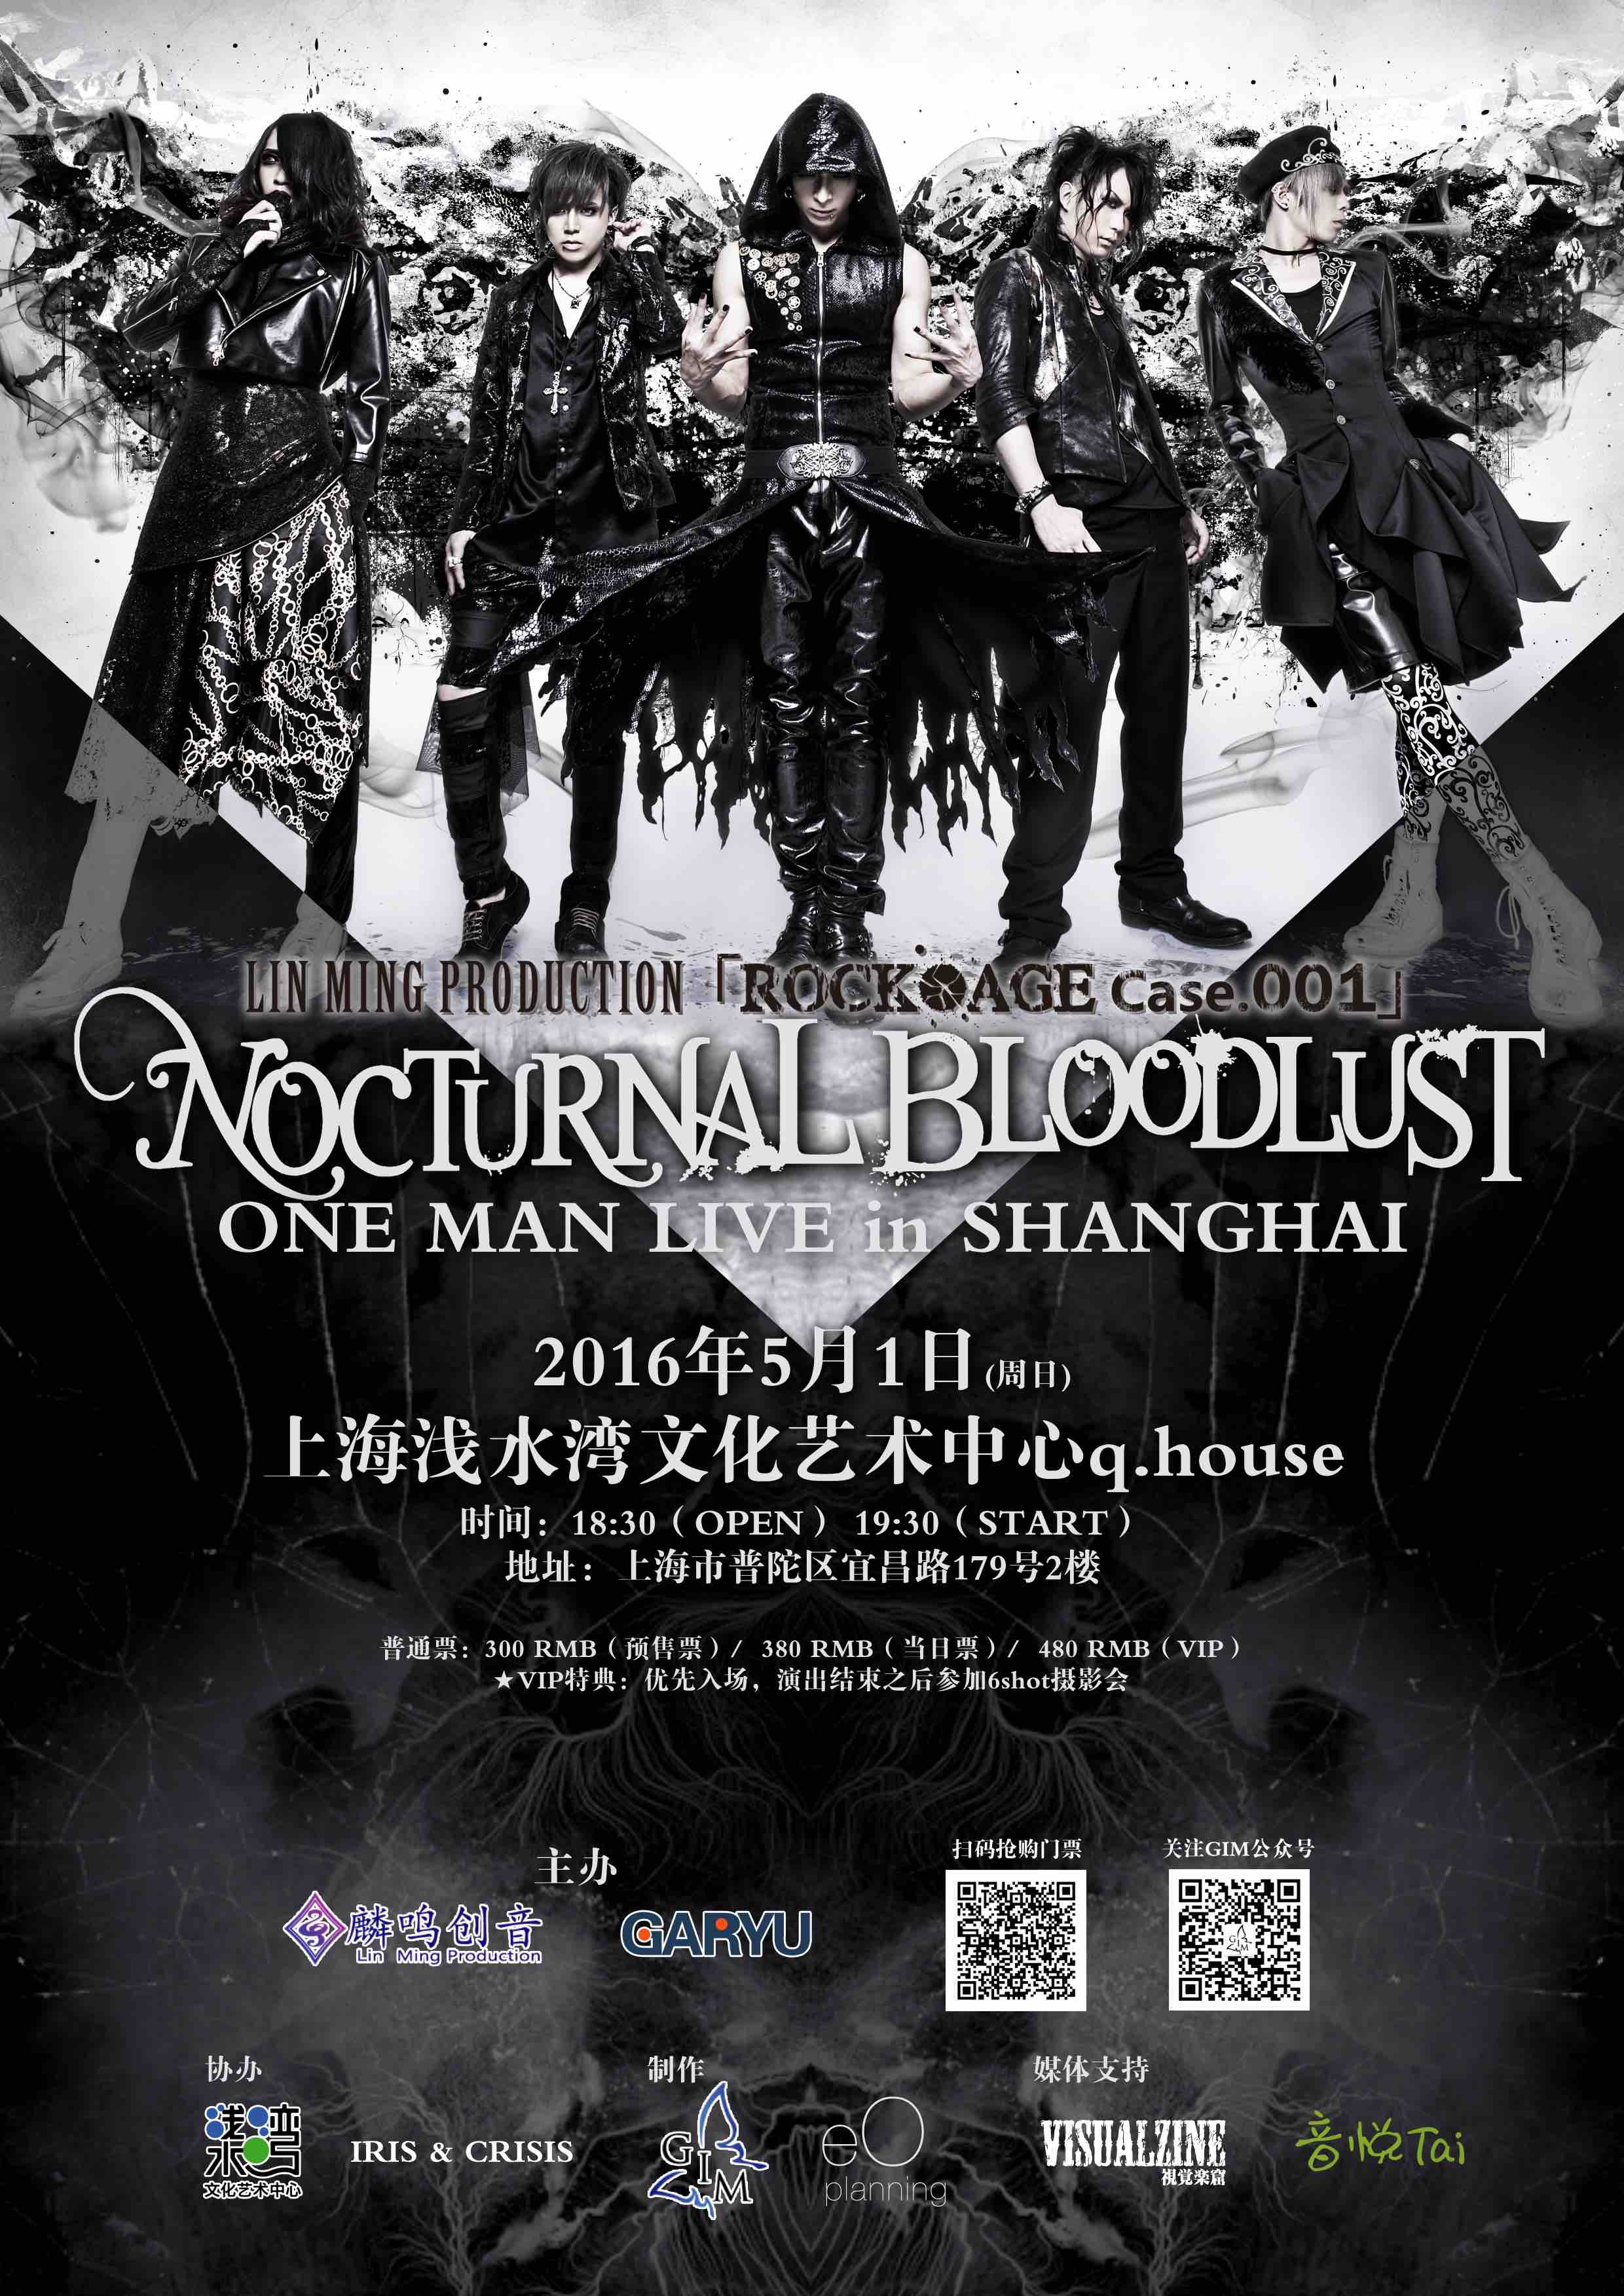 NOCTURNAL BLOODLUST 上海公演